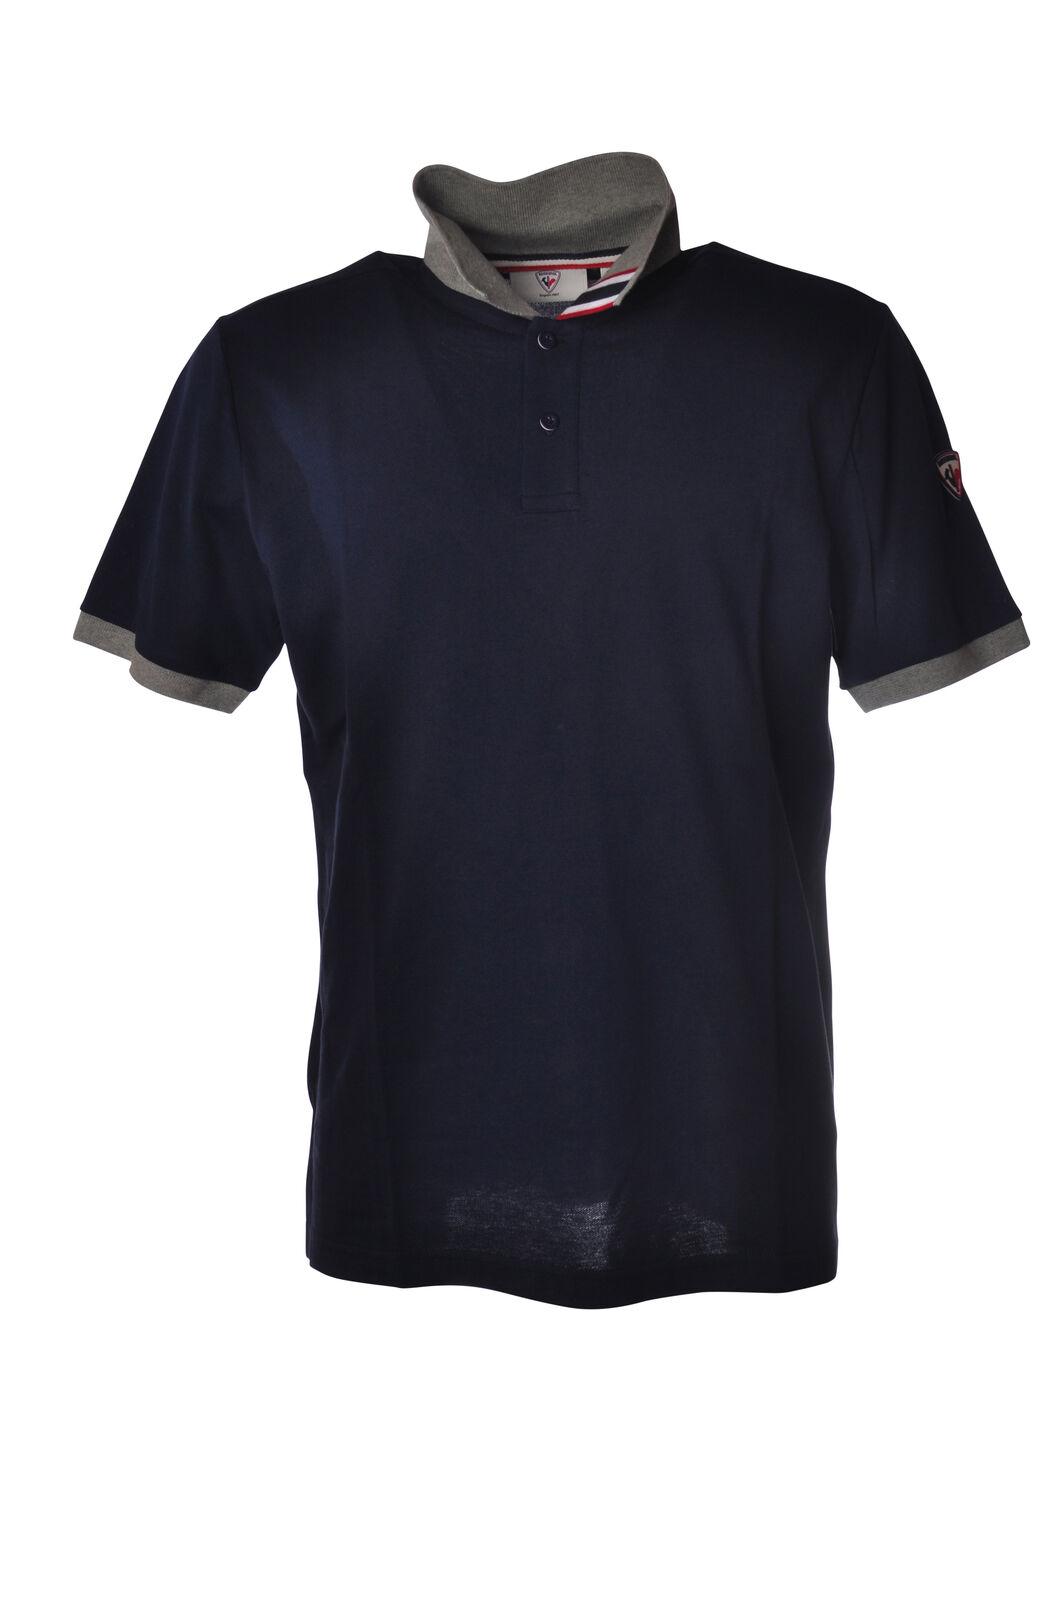 Rossignol - Topwear Polo - Mann - blue - 5208213D184034